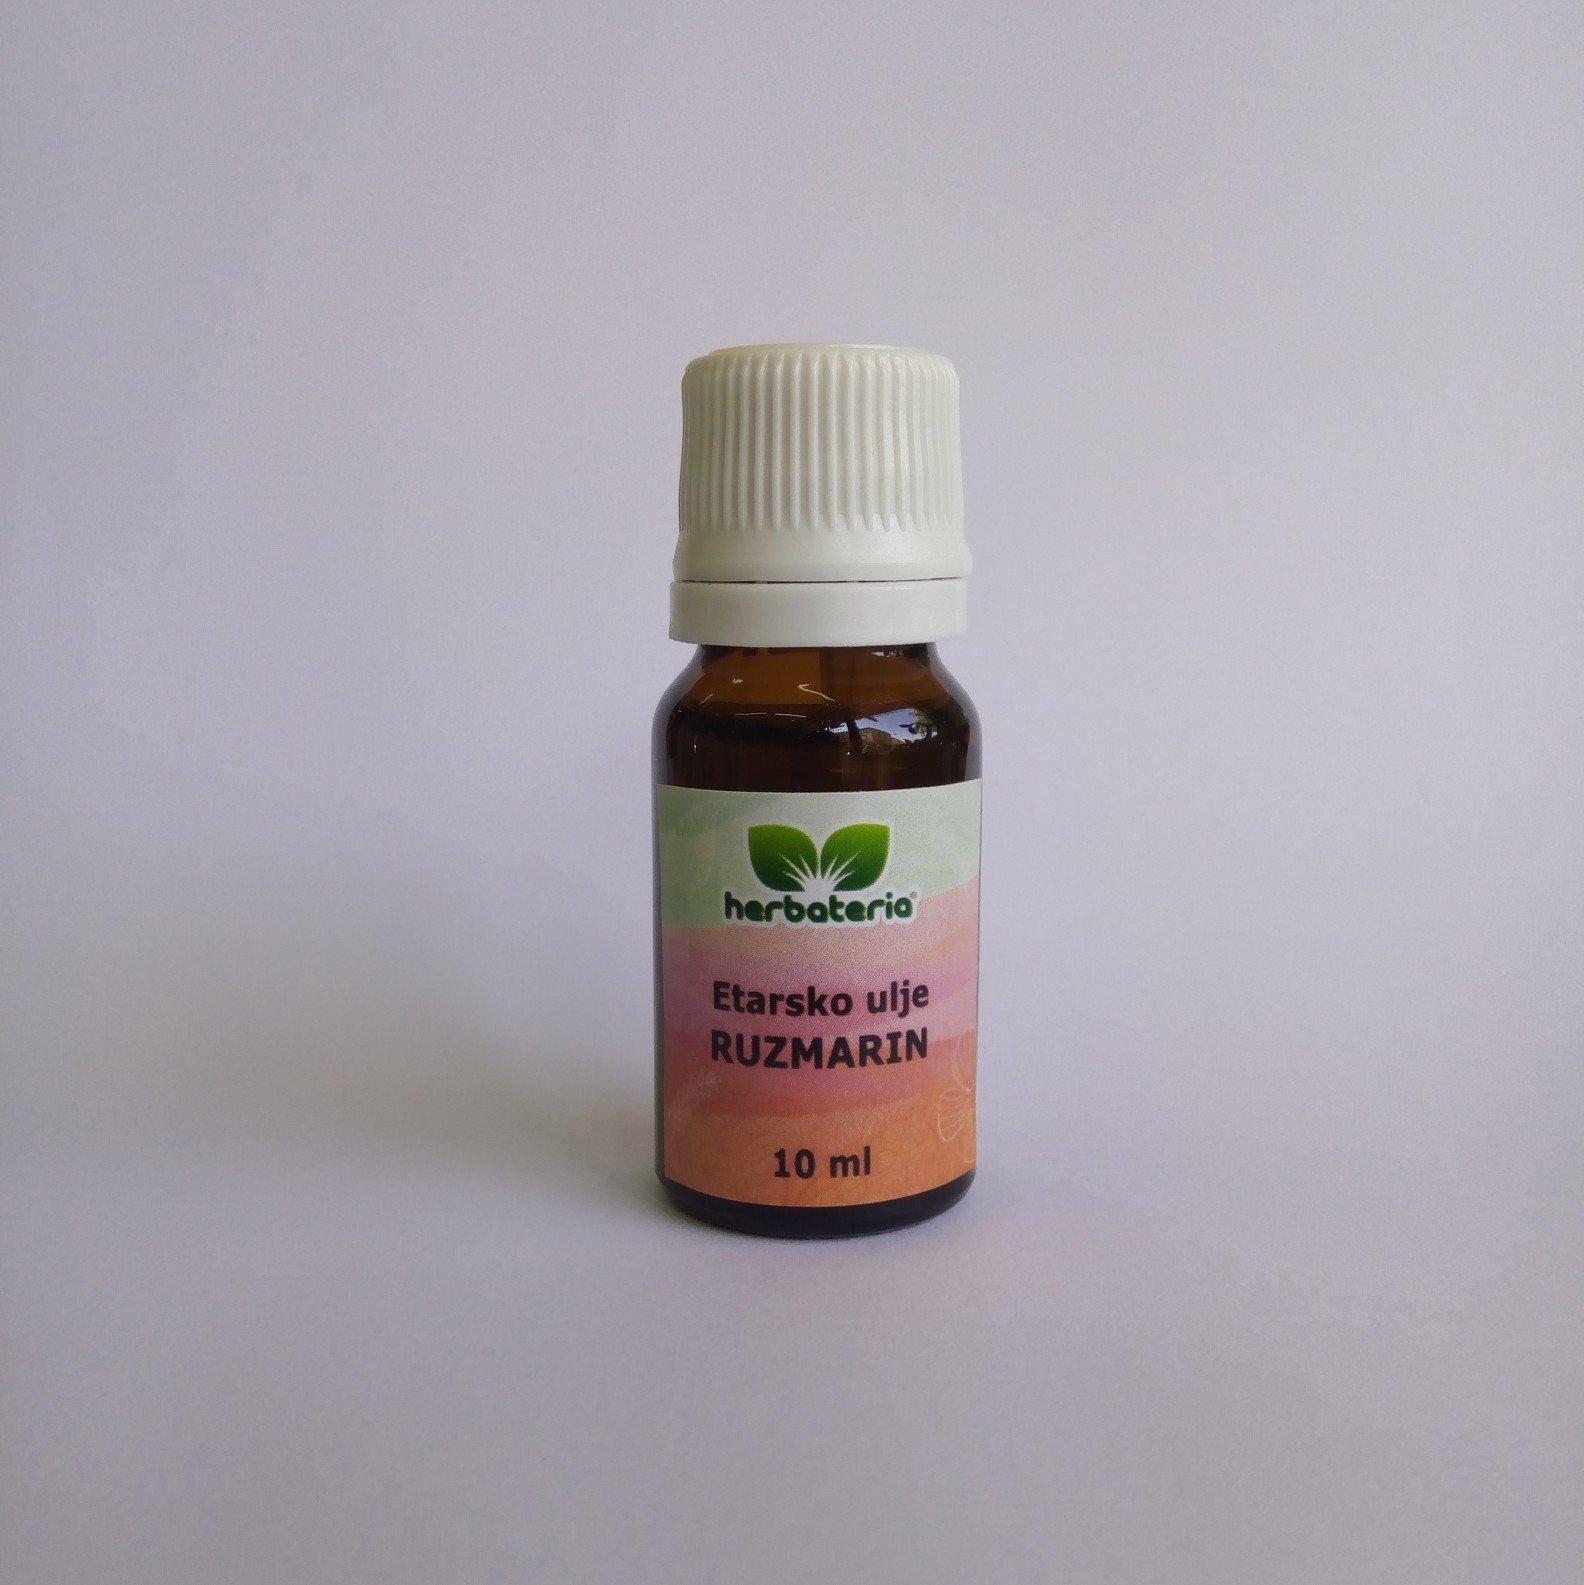 Herbateria - etarsko ulje ruzmarin 10 ml 00418